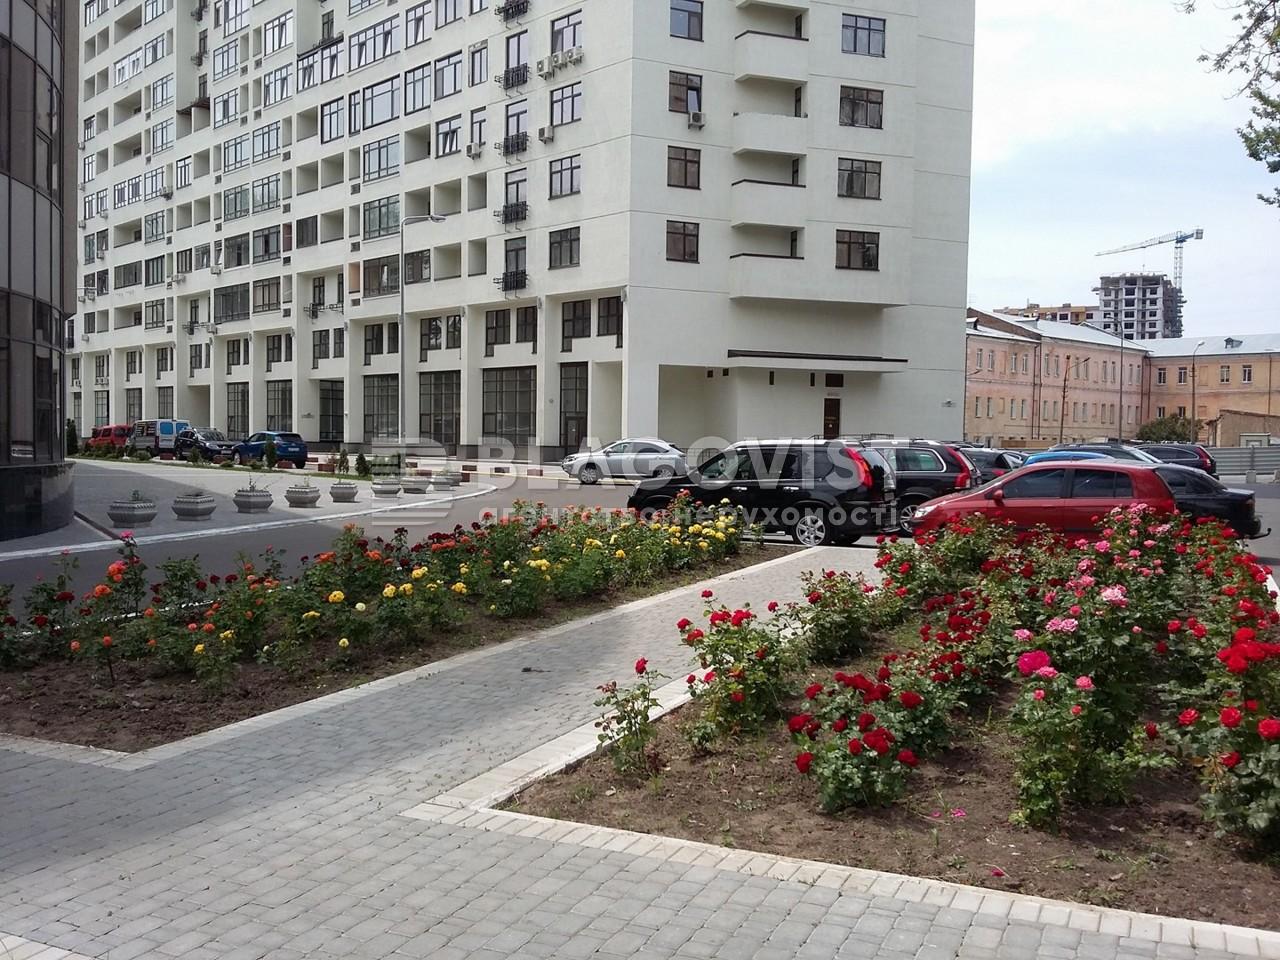 Нежитлове приміщення, H-34490, Коновальця Євгена (Щорса), Київ - Фото 13